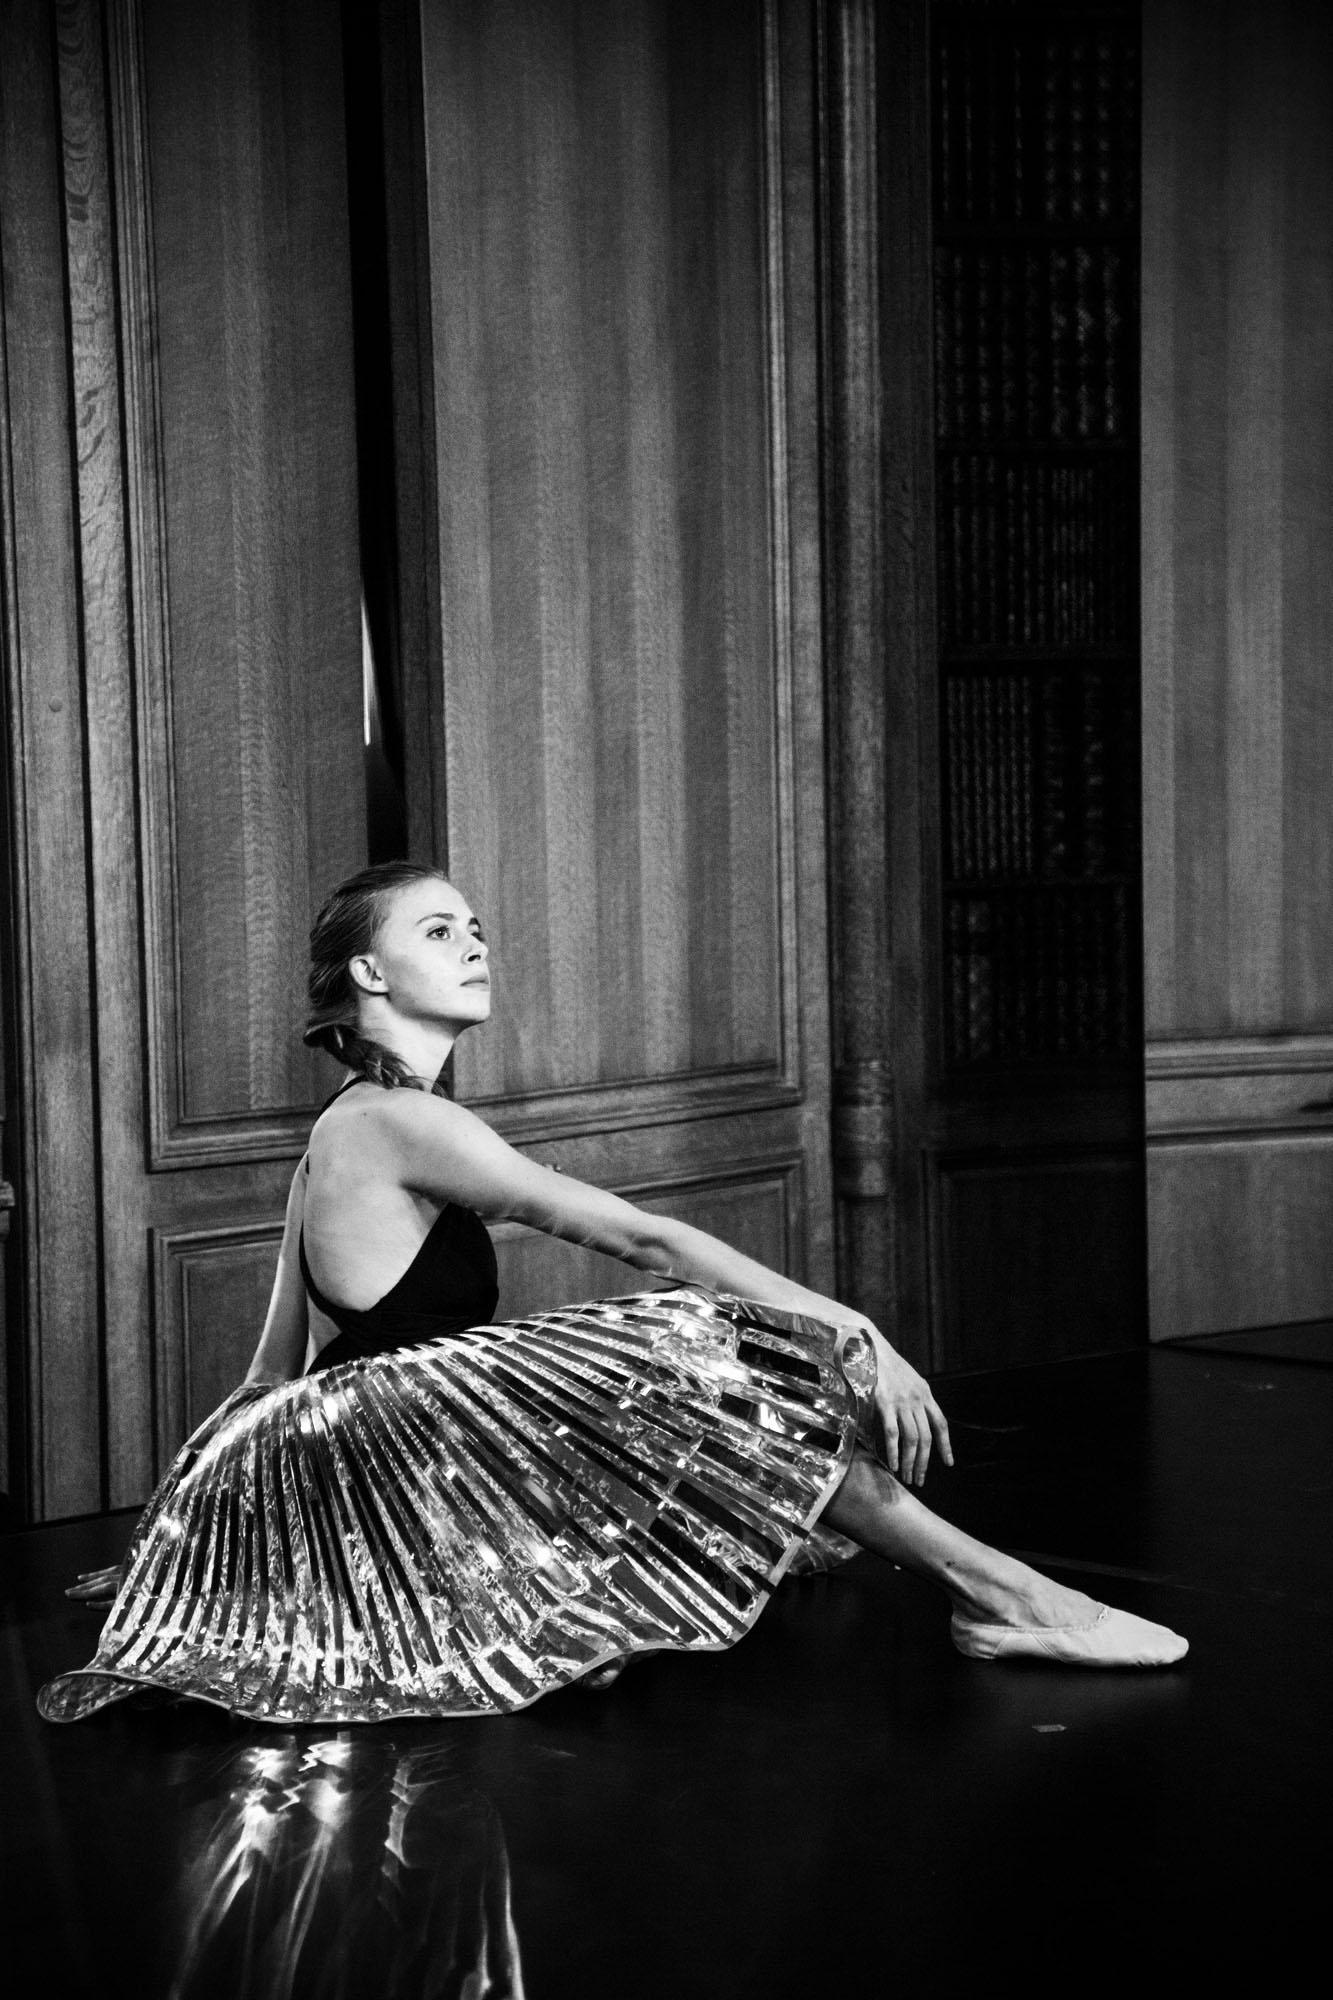 nyc_ballet_x_cartier_042